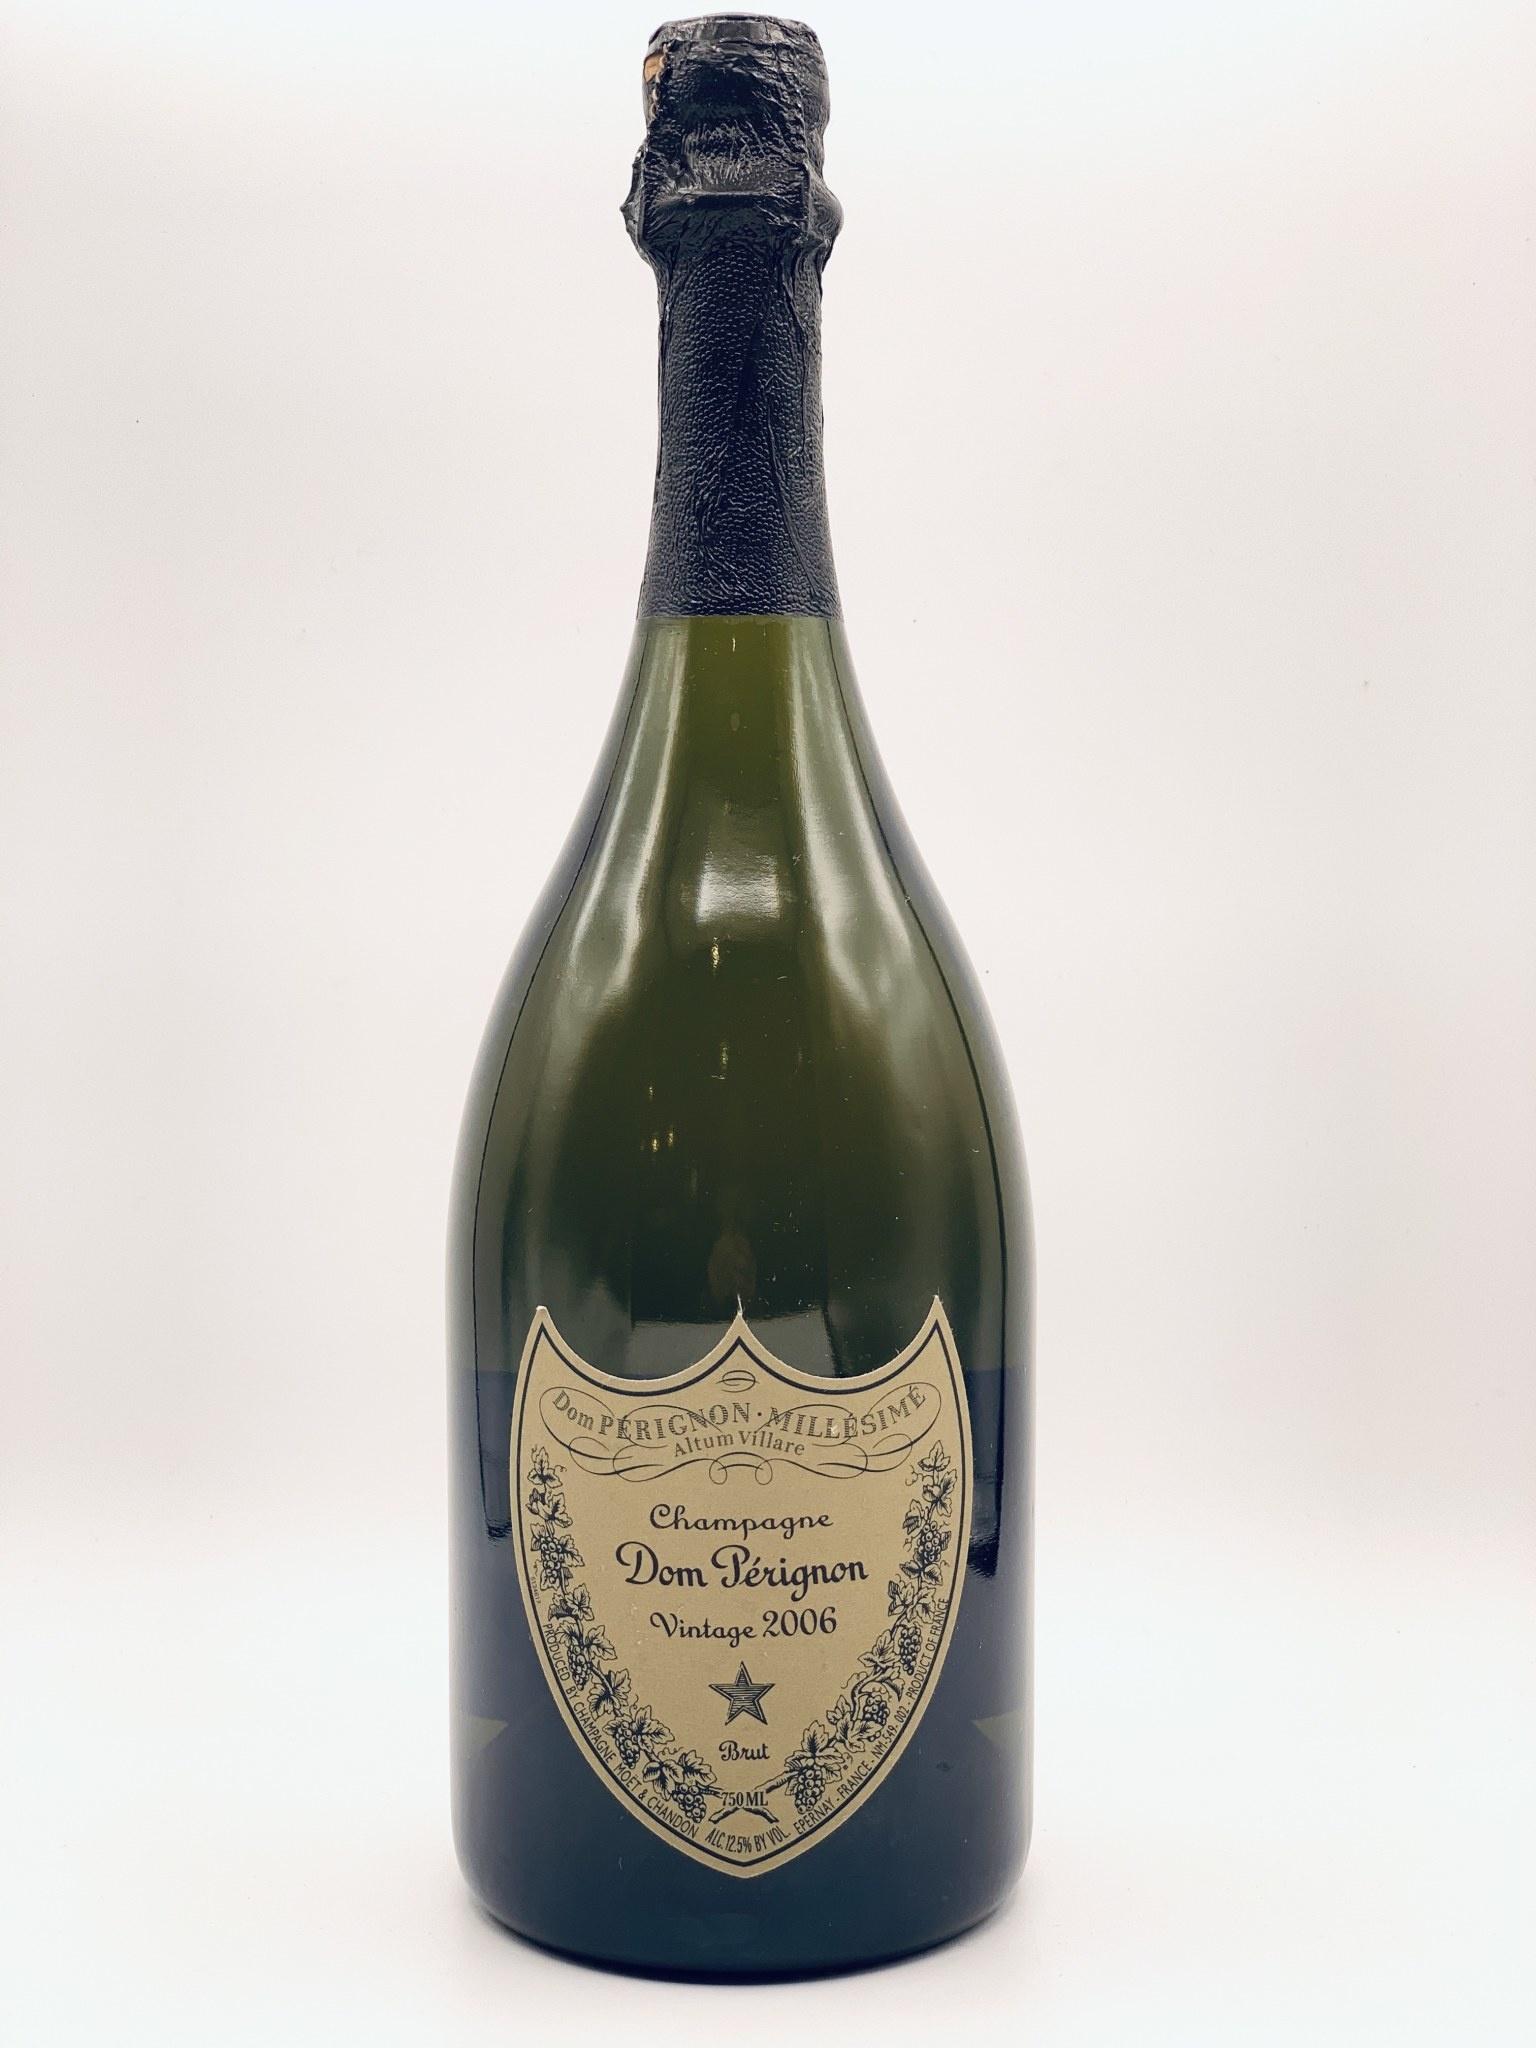 Champagne Brut Grand Cru 2006 Moet & Chandon Dom Perignon